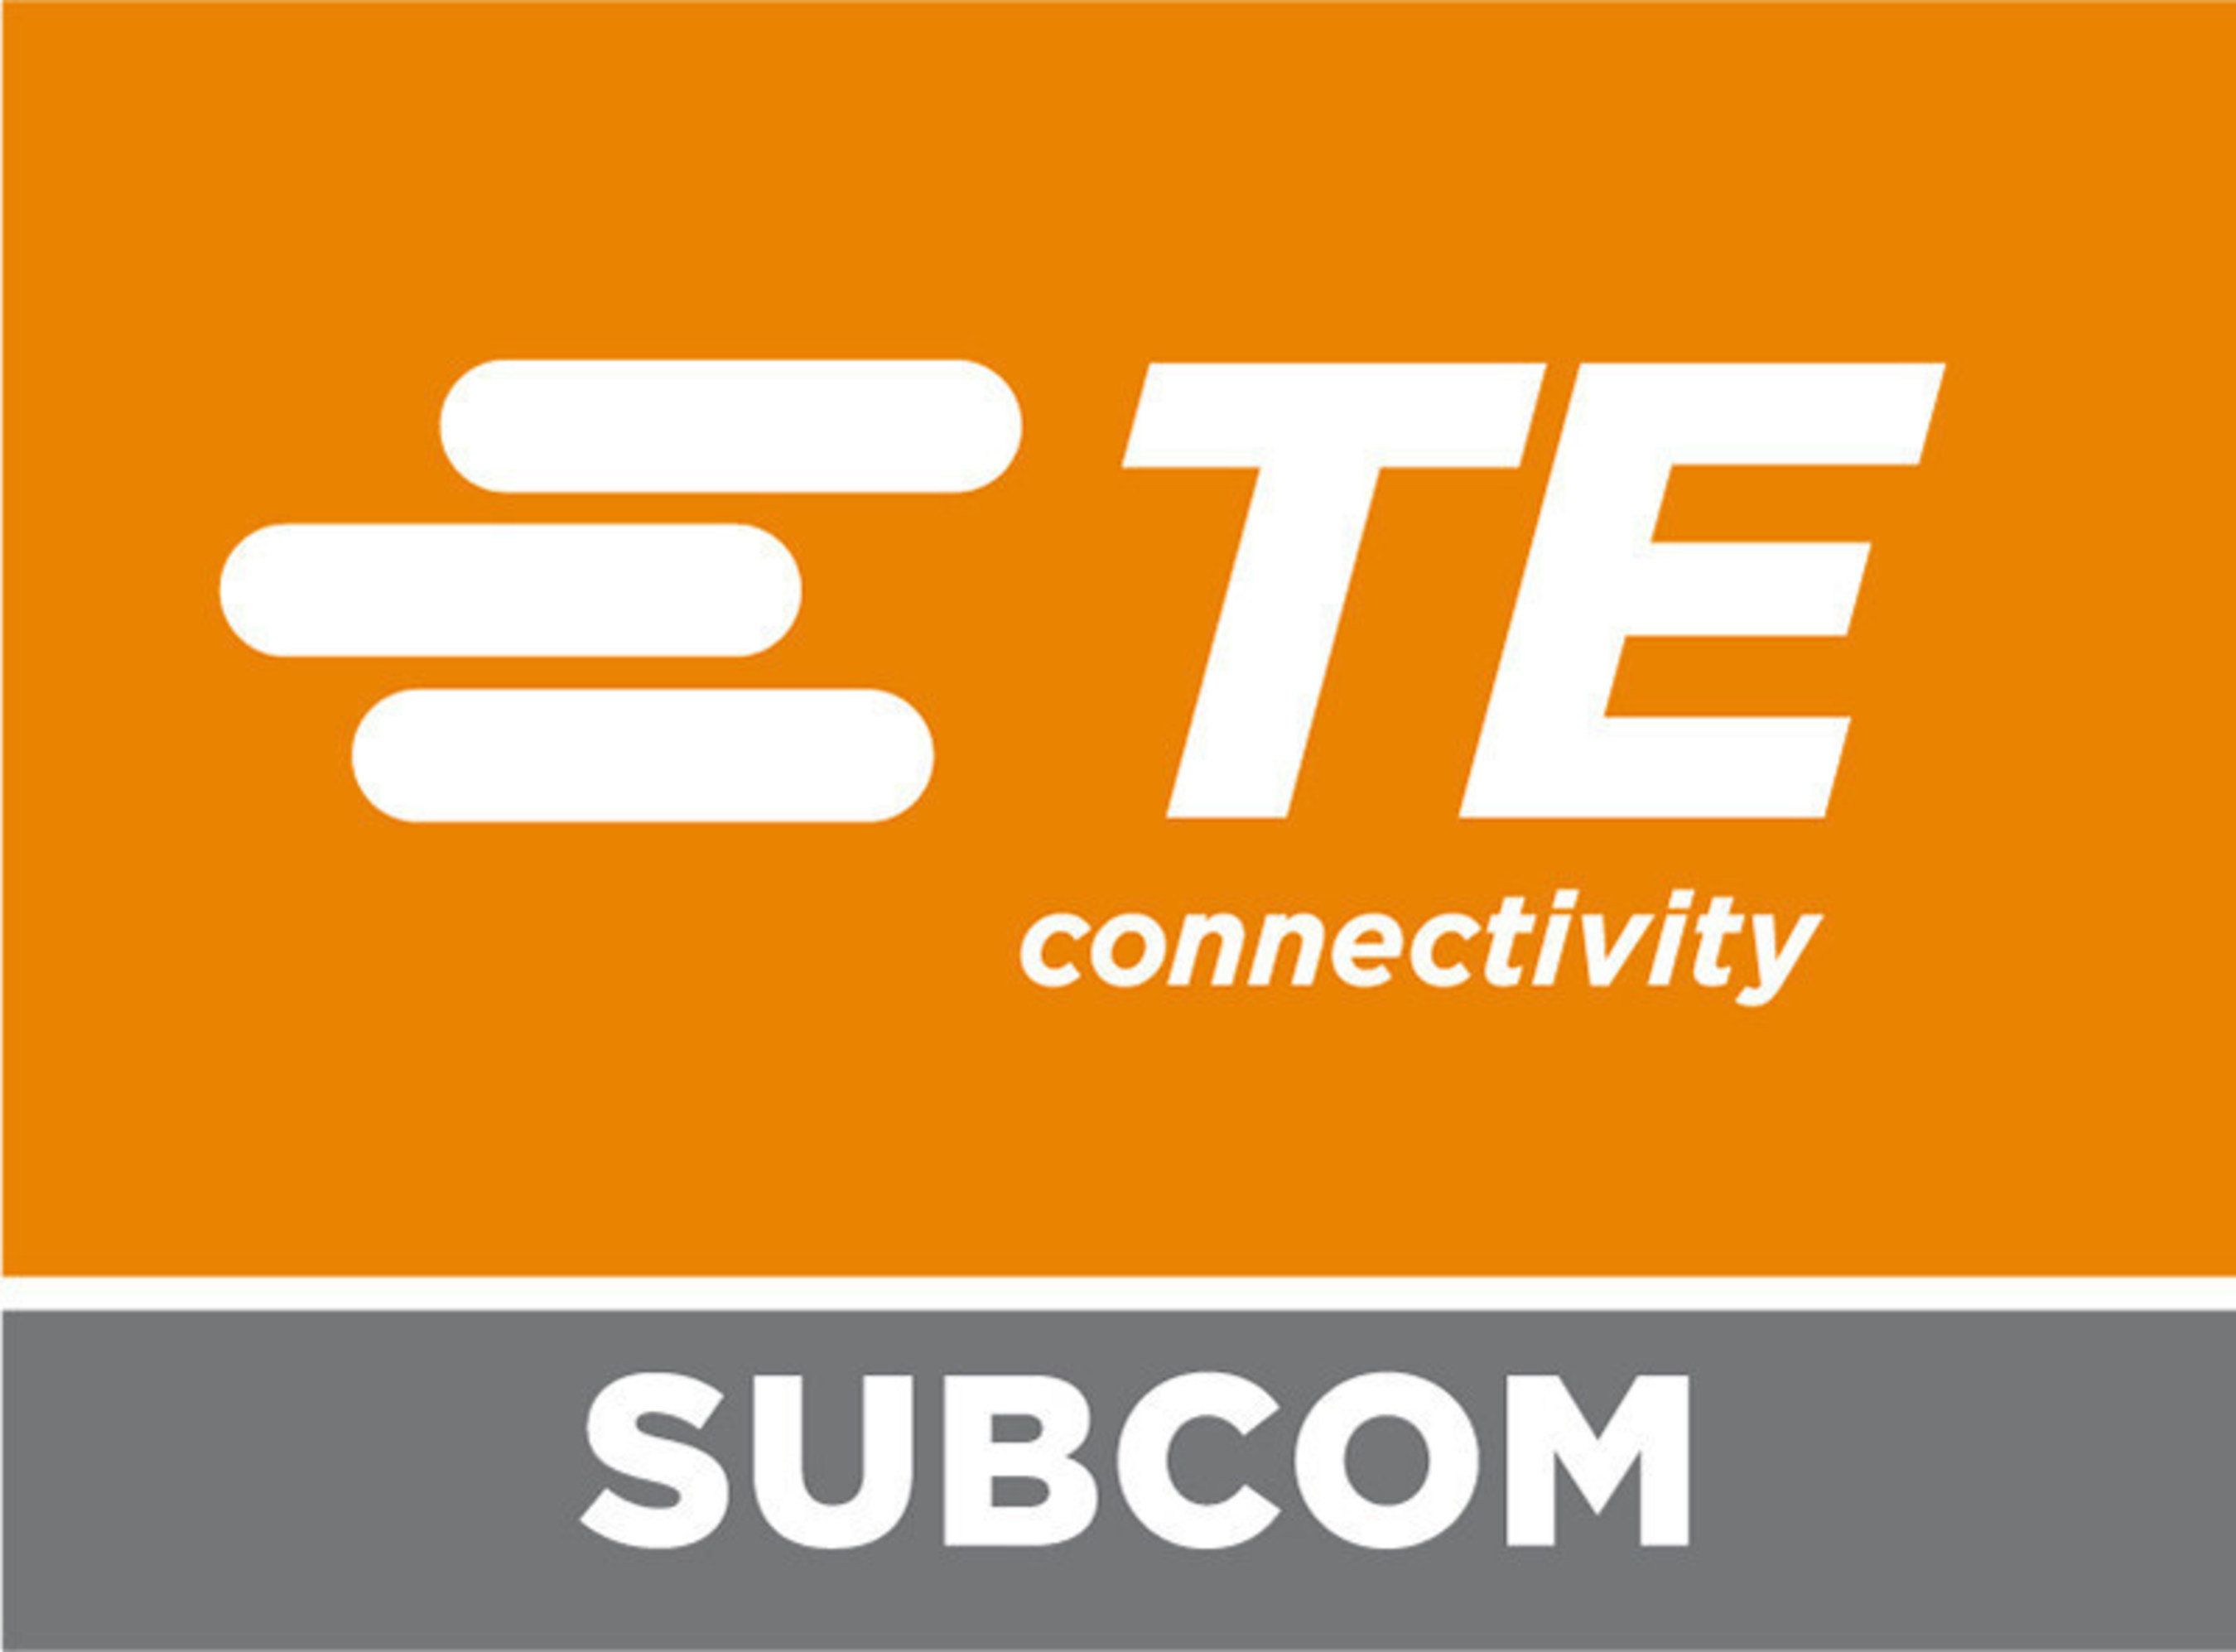 TE SubCom Supplies MAREA Submarine Cable System